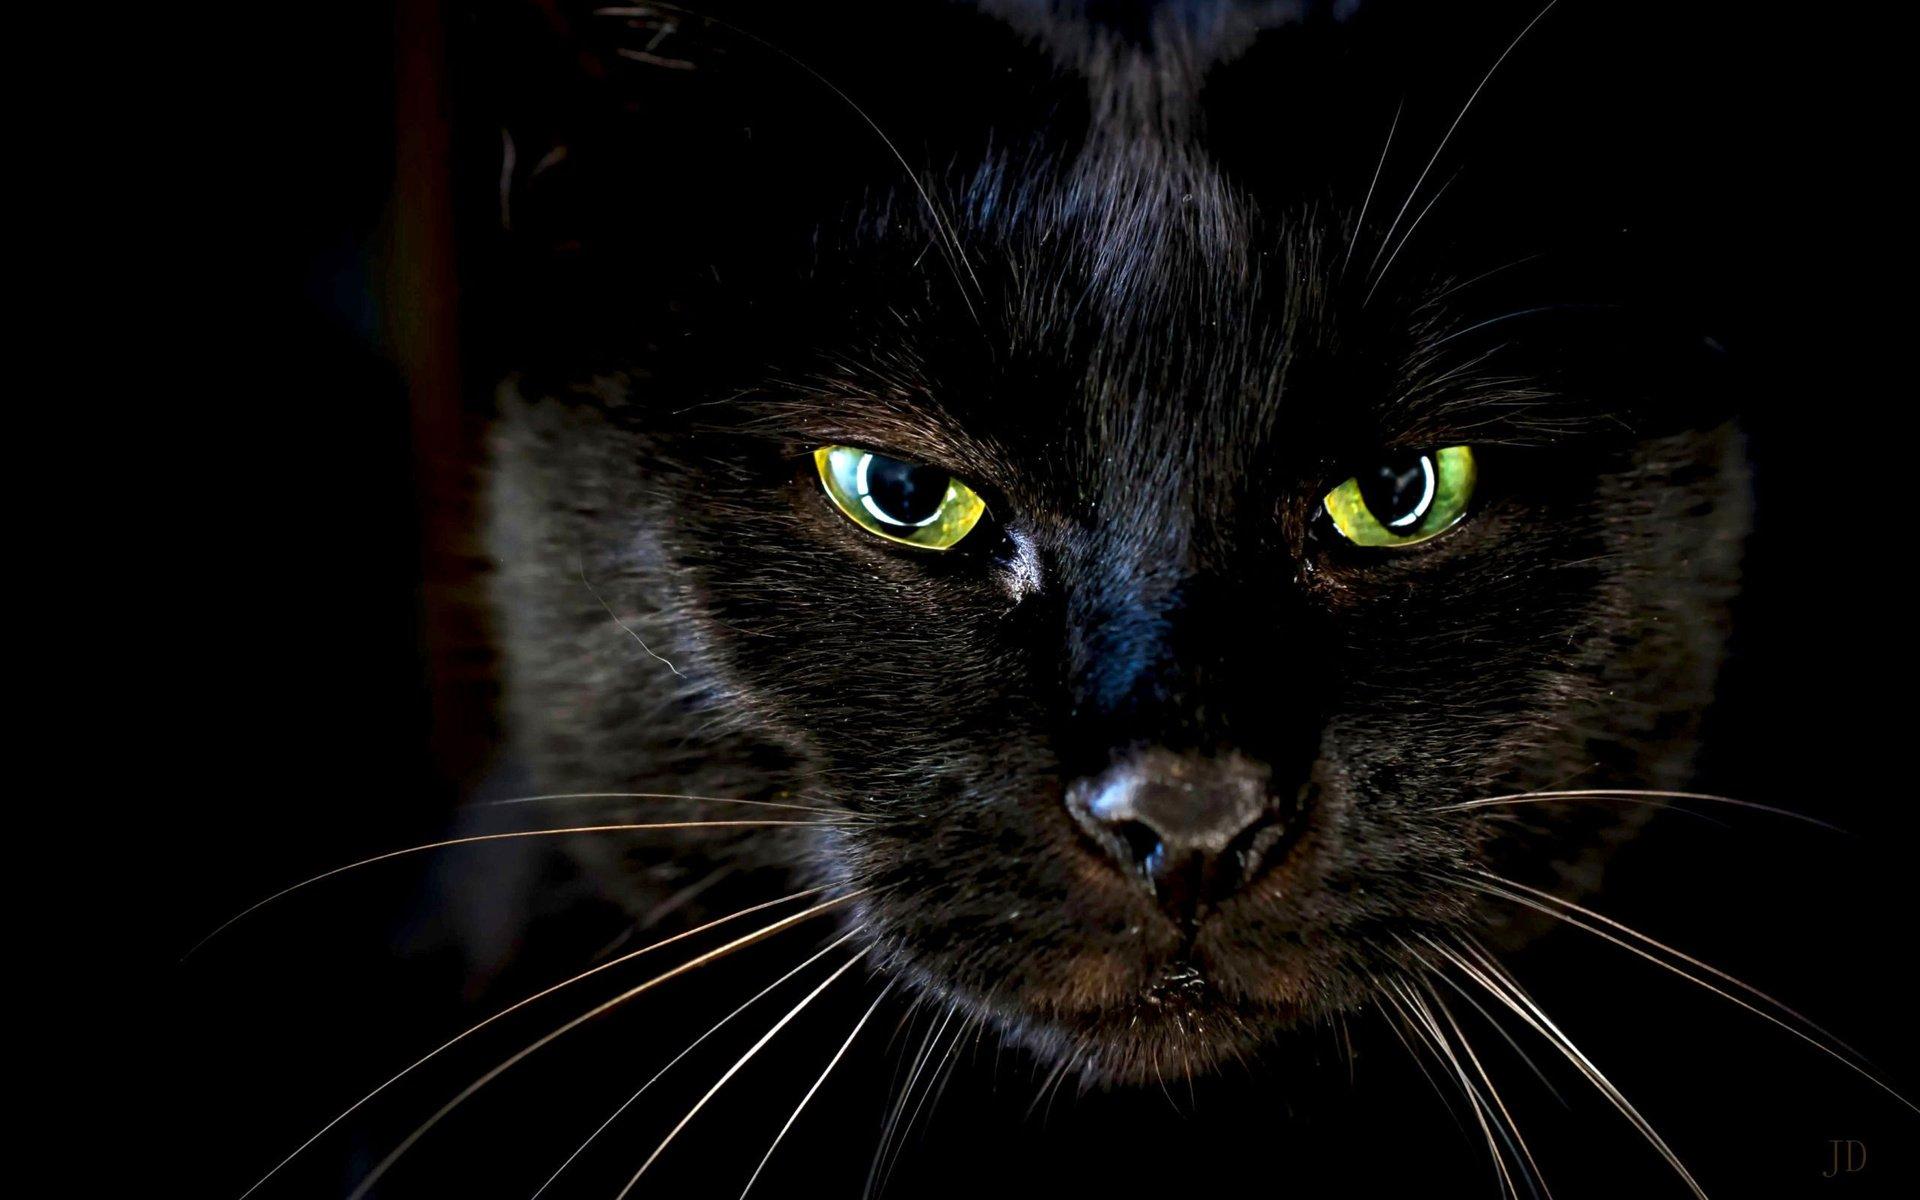 картинки глаз черной кошки связи этим скандал